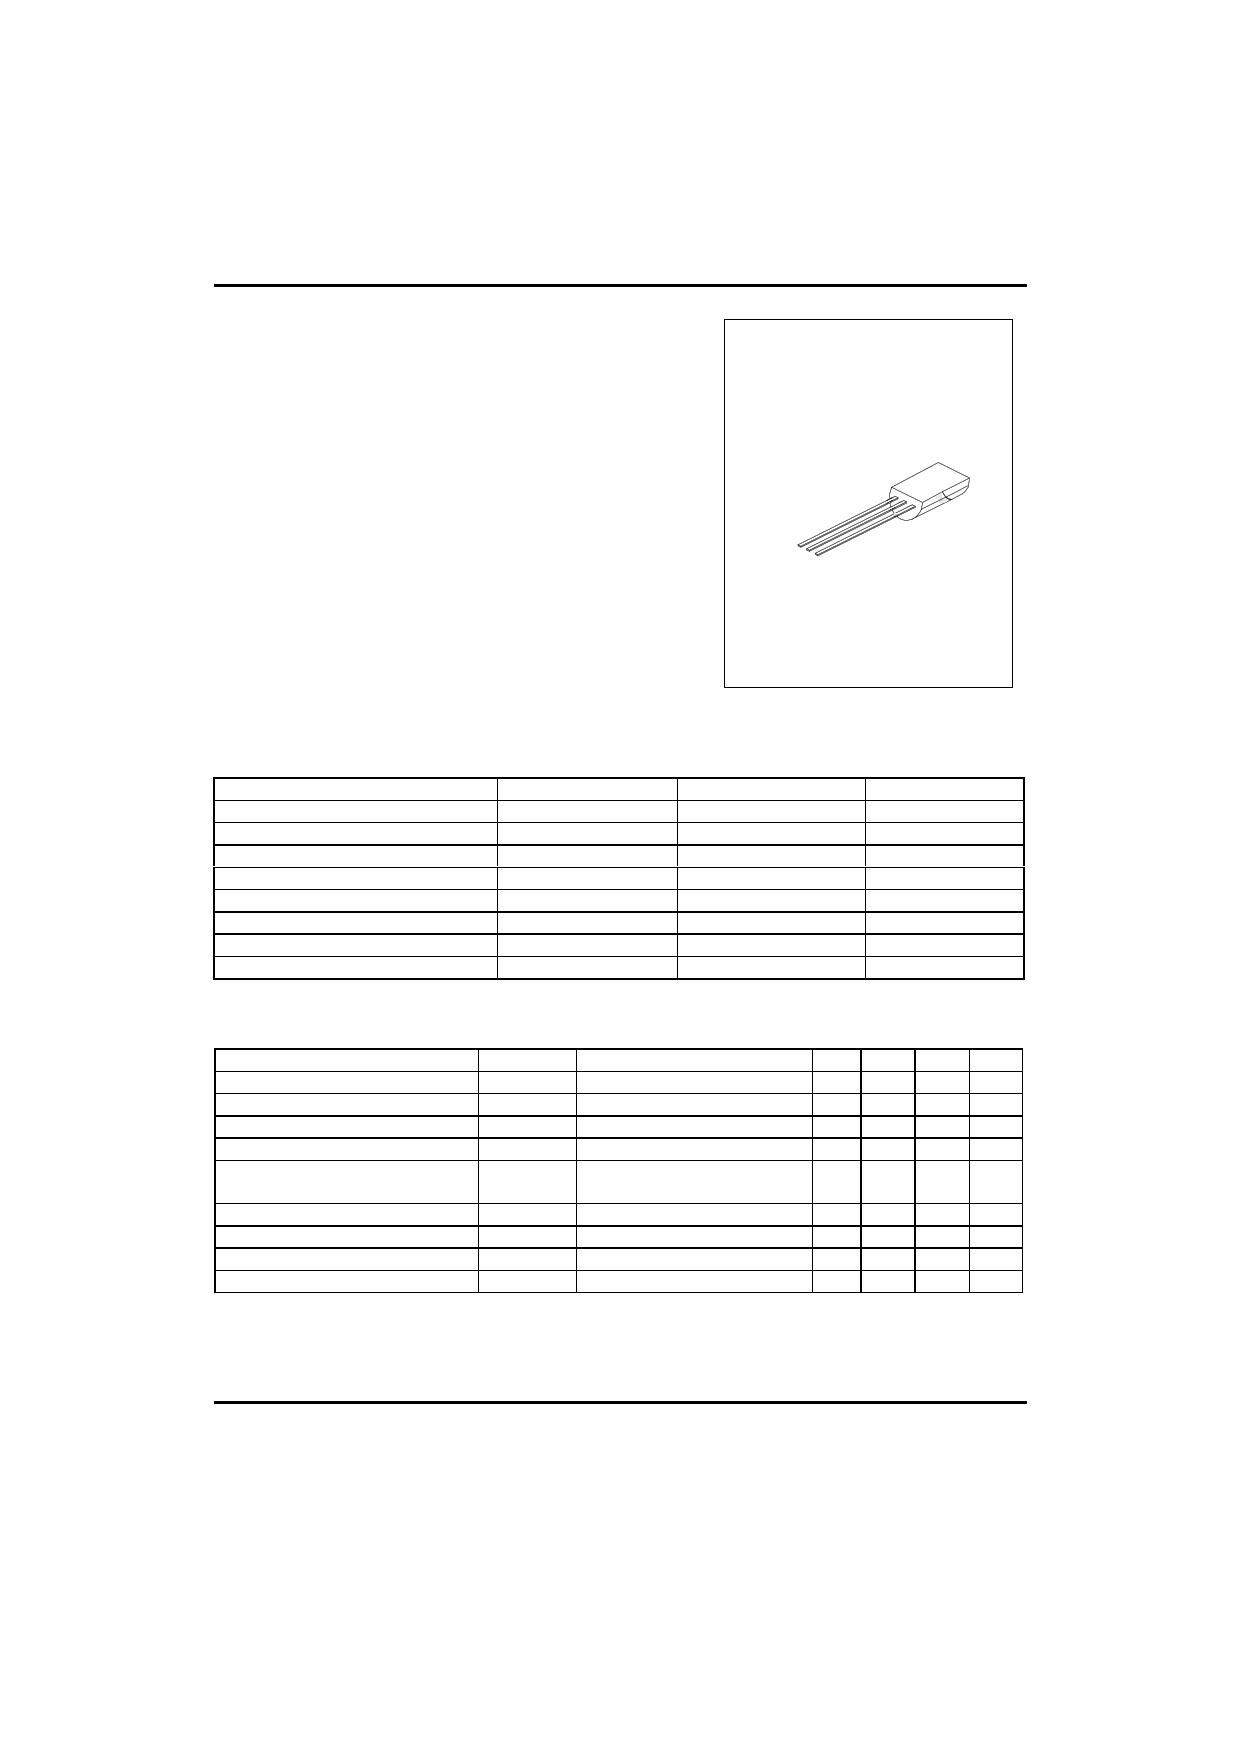 UTC2SC1384 datasheet